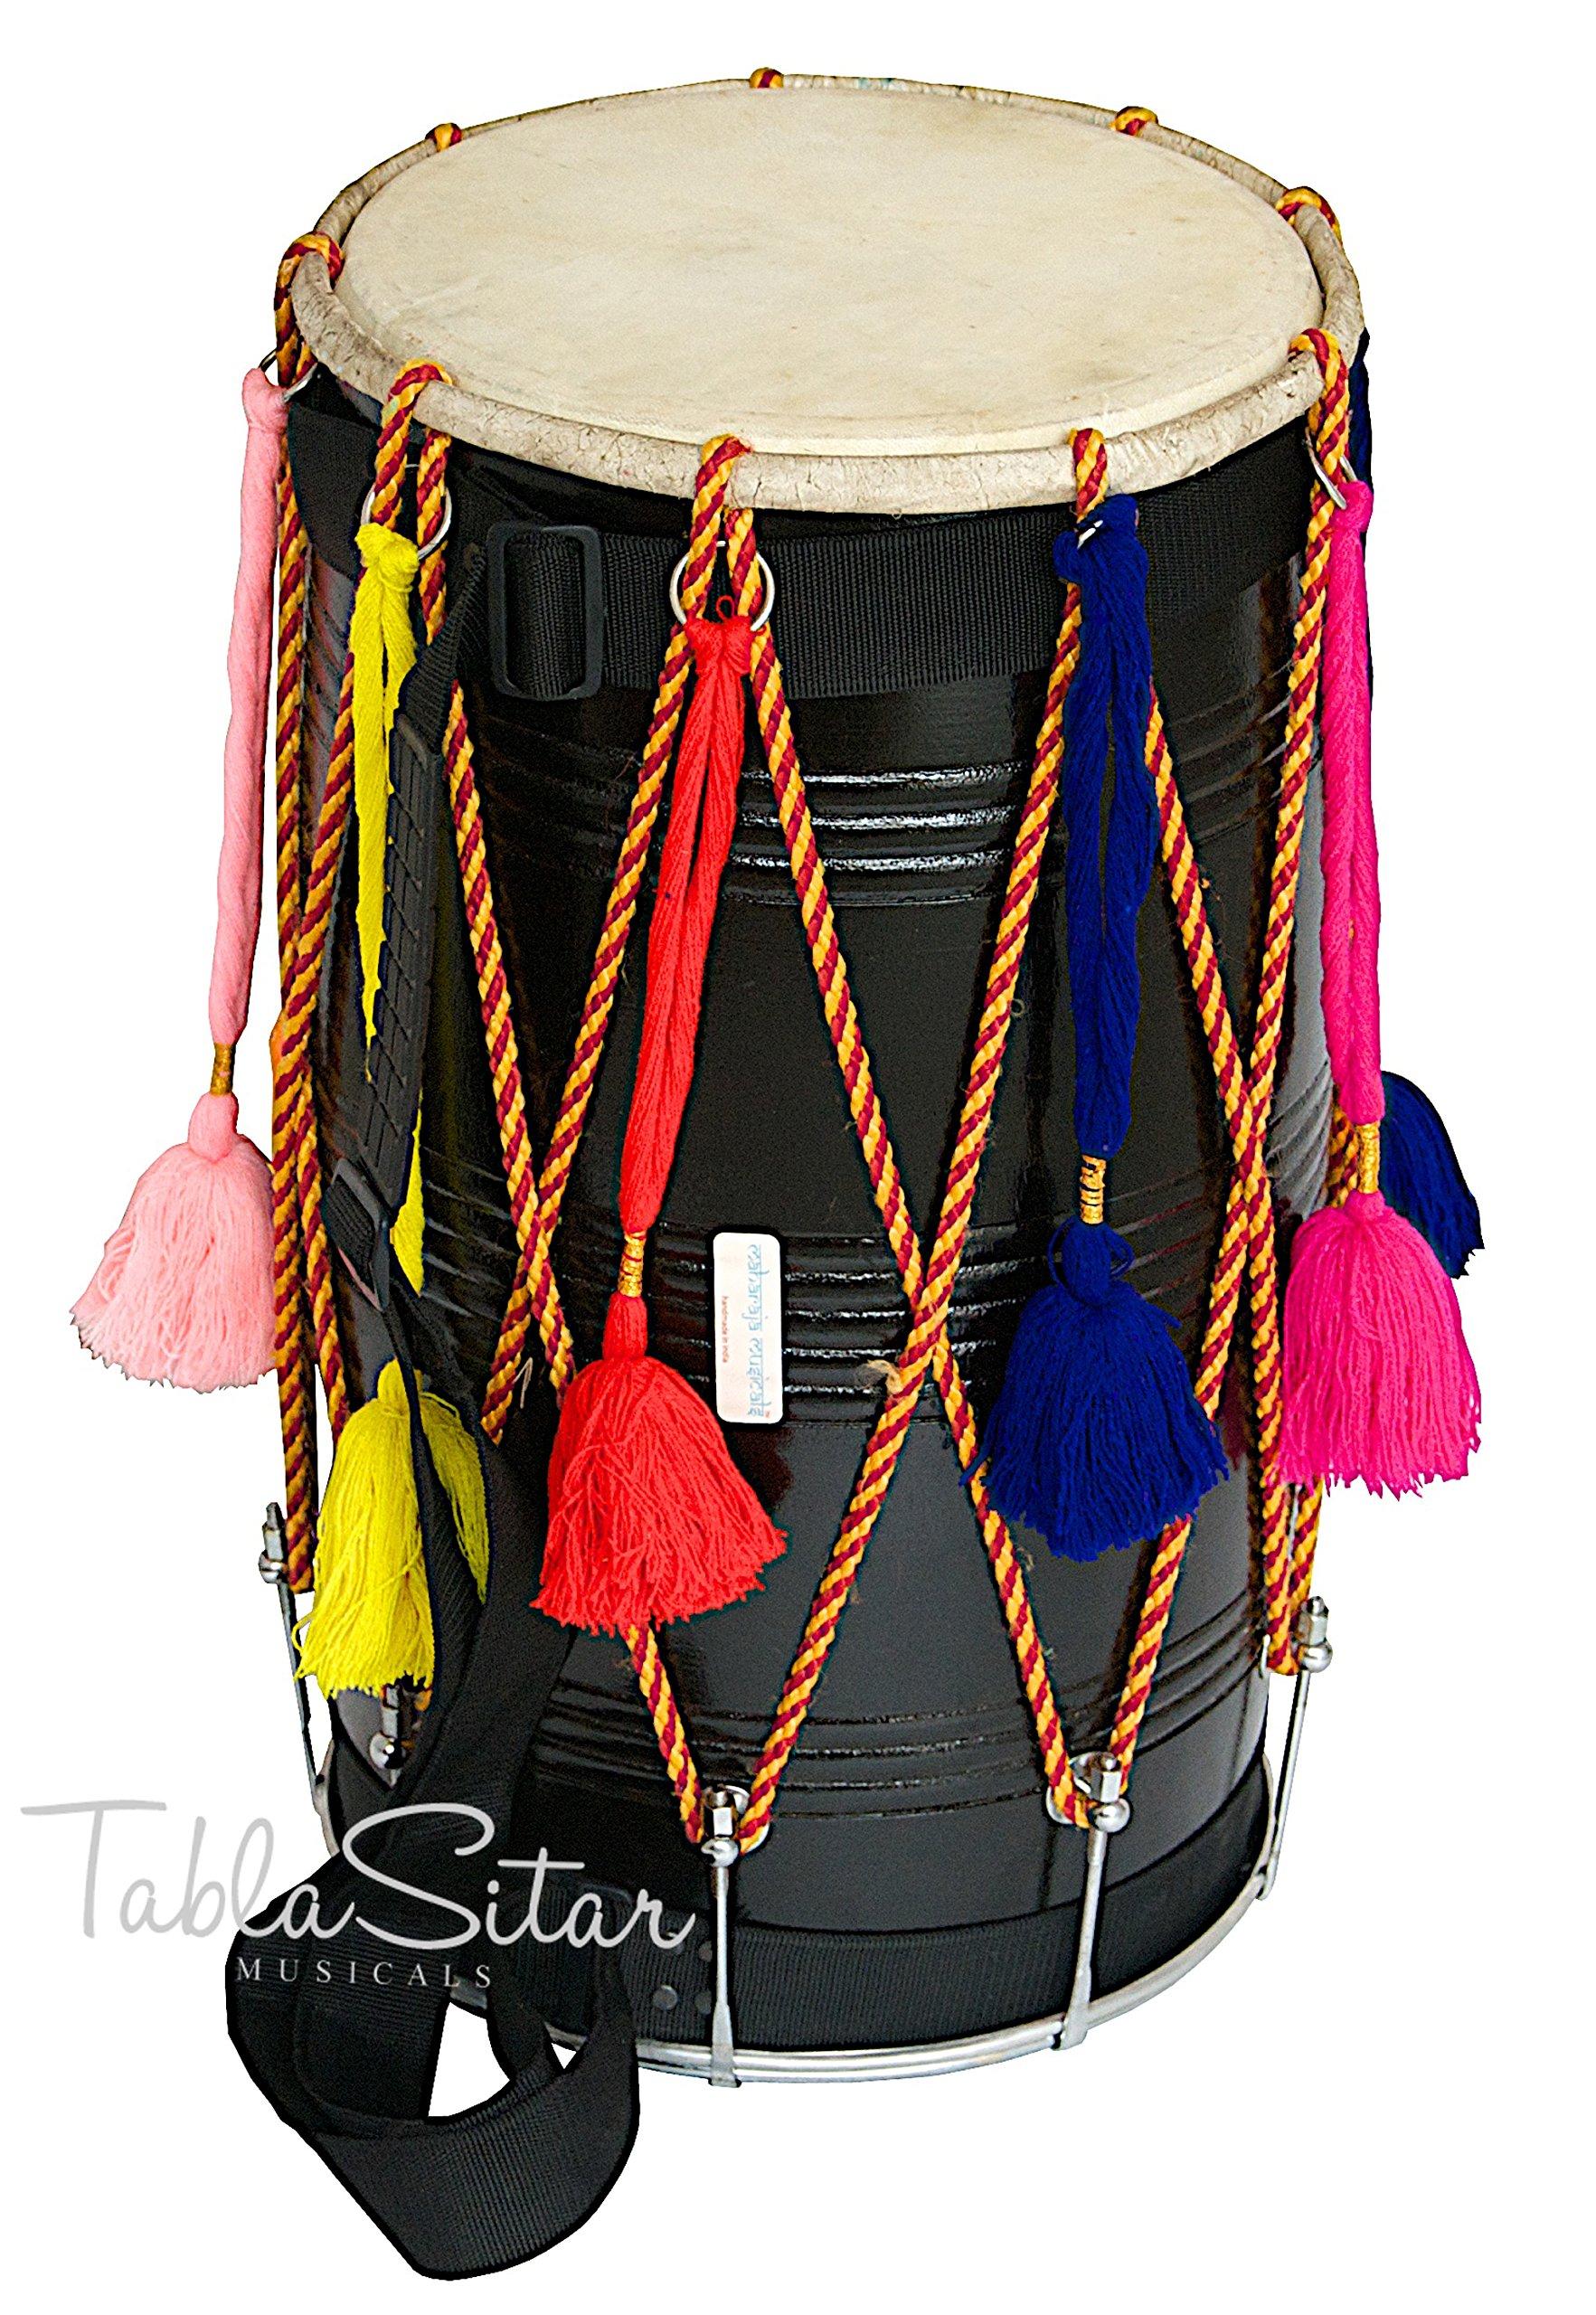 Maharaja Musicals Bhangra Dhol Drum, Mango Wood, Black, Barrel Shaped, Padded Bag, Beaters, Nylon Strap, Punjabi Dhol Drum (PDI-CE)